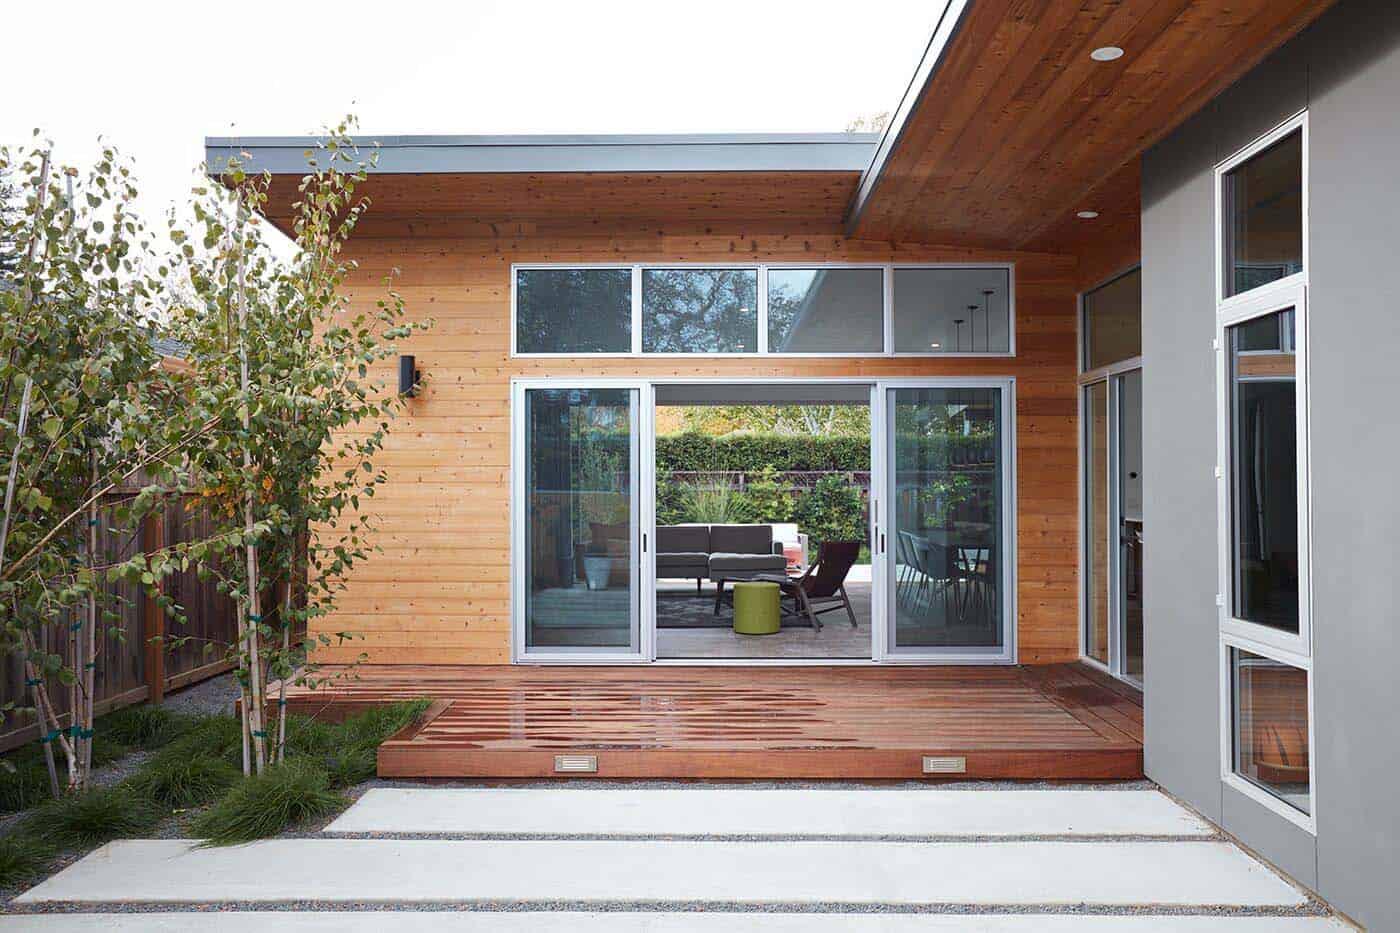 Mid-Century Modern Dwelling-Klopf Architecture-19-1 Kindesign